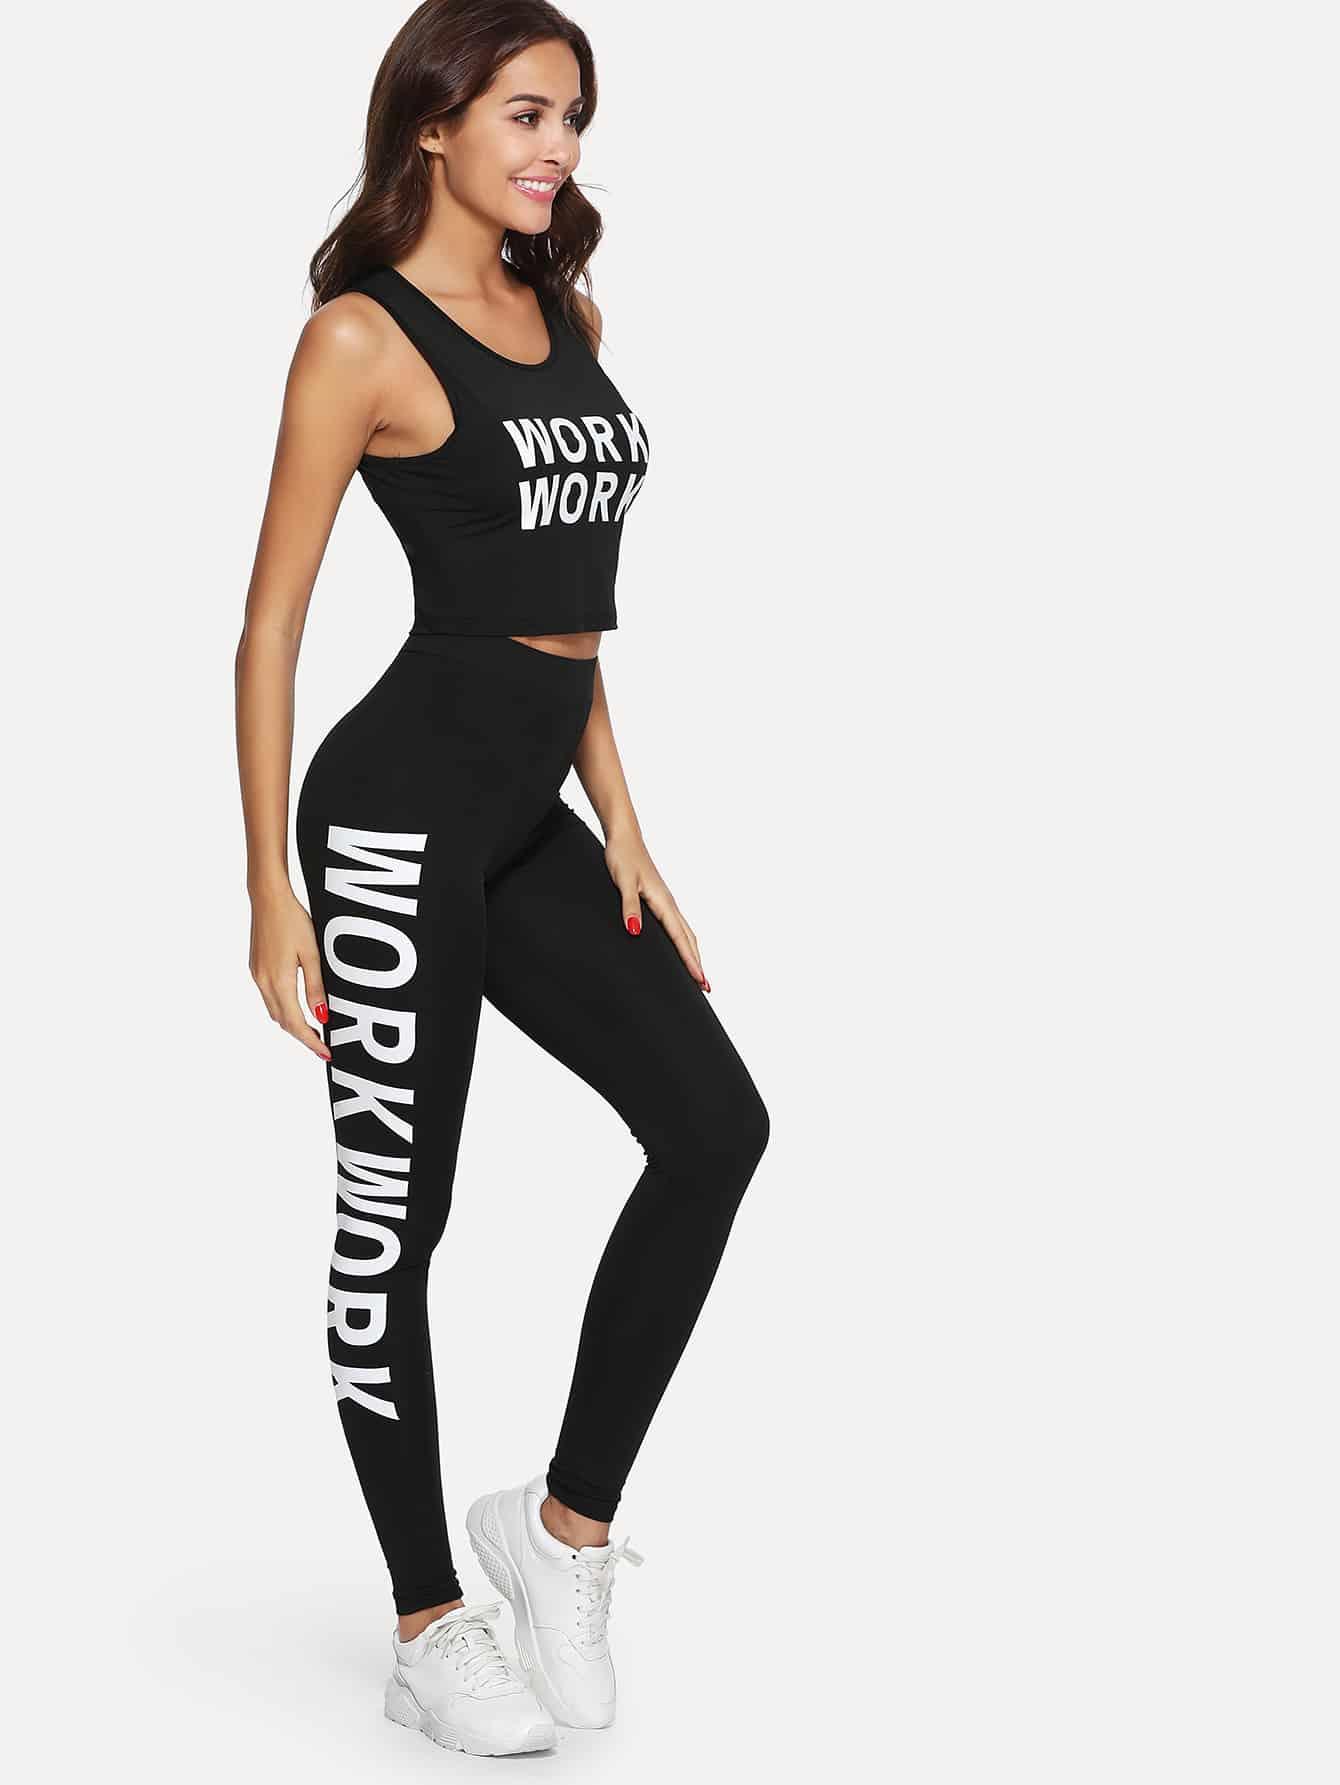 Slogan Print Crop Tank Top & Leggings Set camouflage print crop leggings